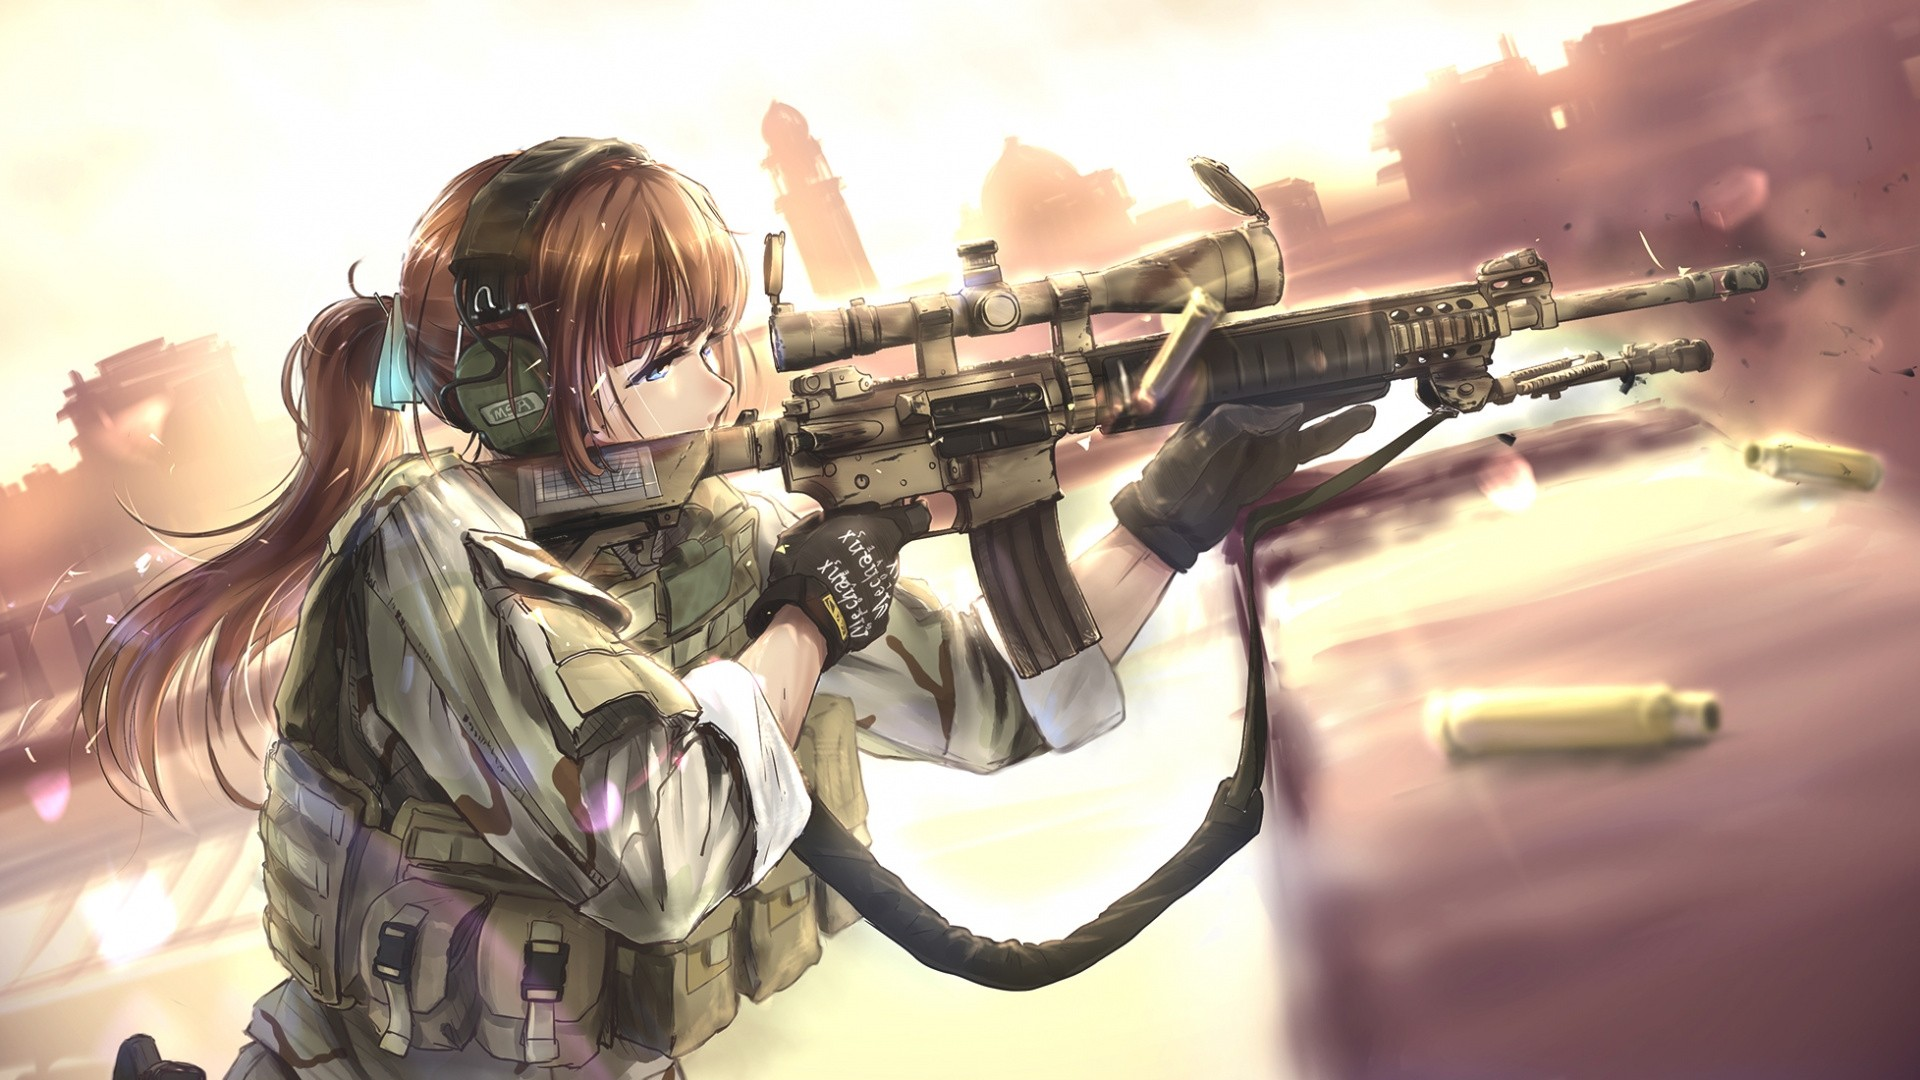 Anime Girls With Guns Wallpaper Full HD